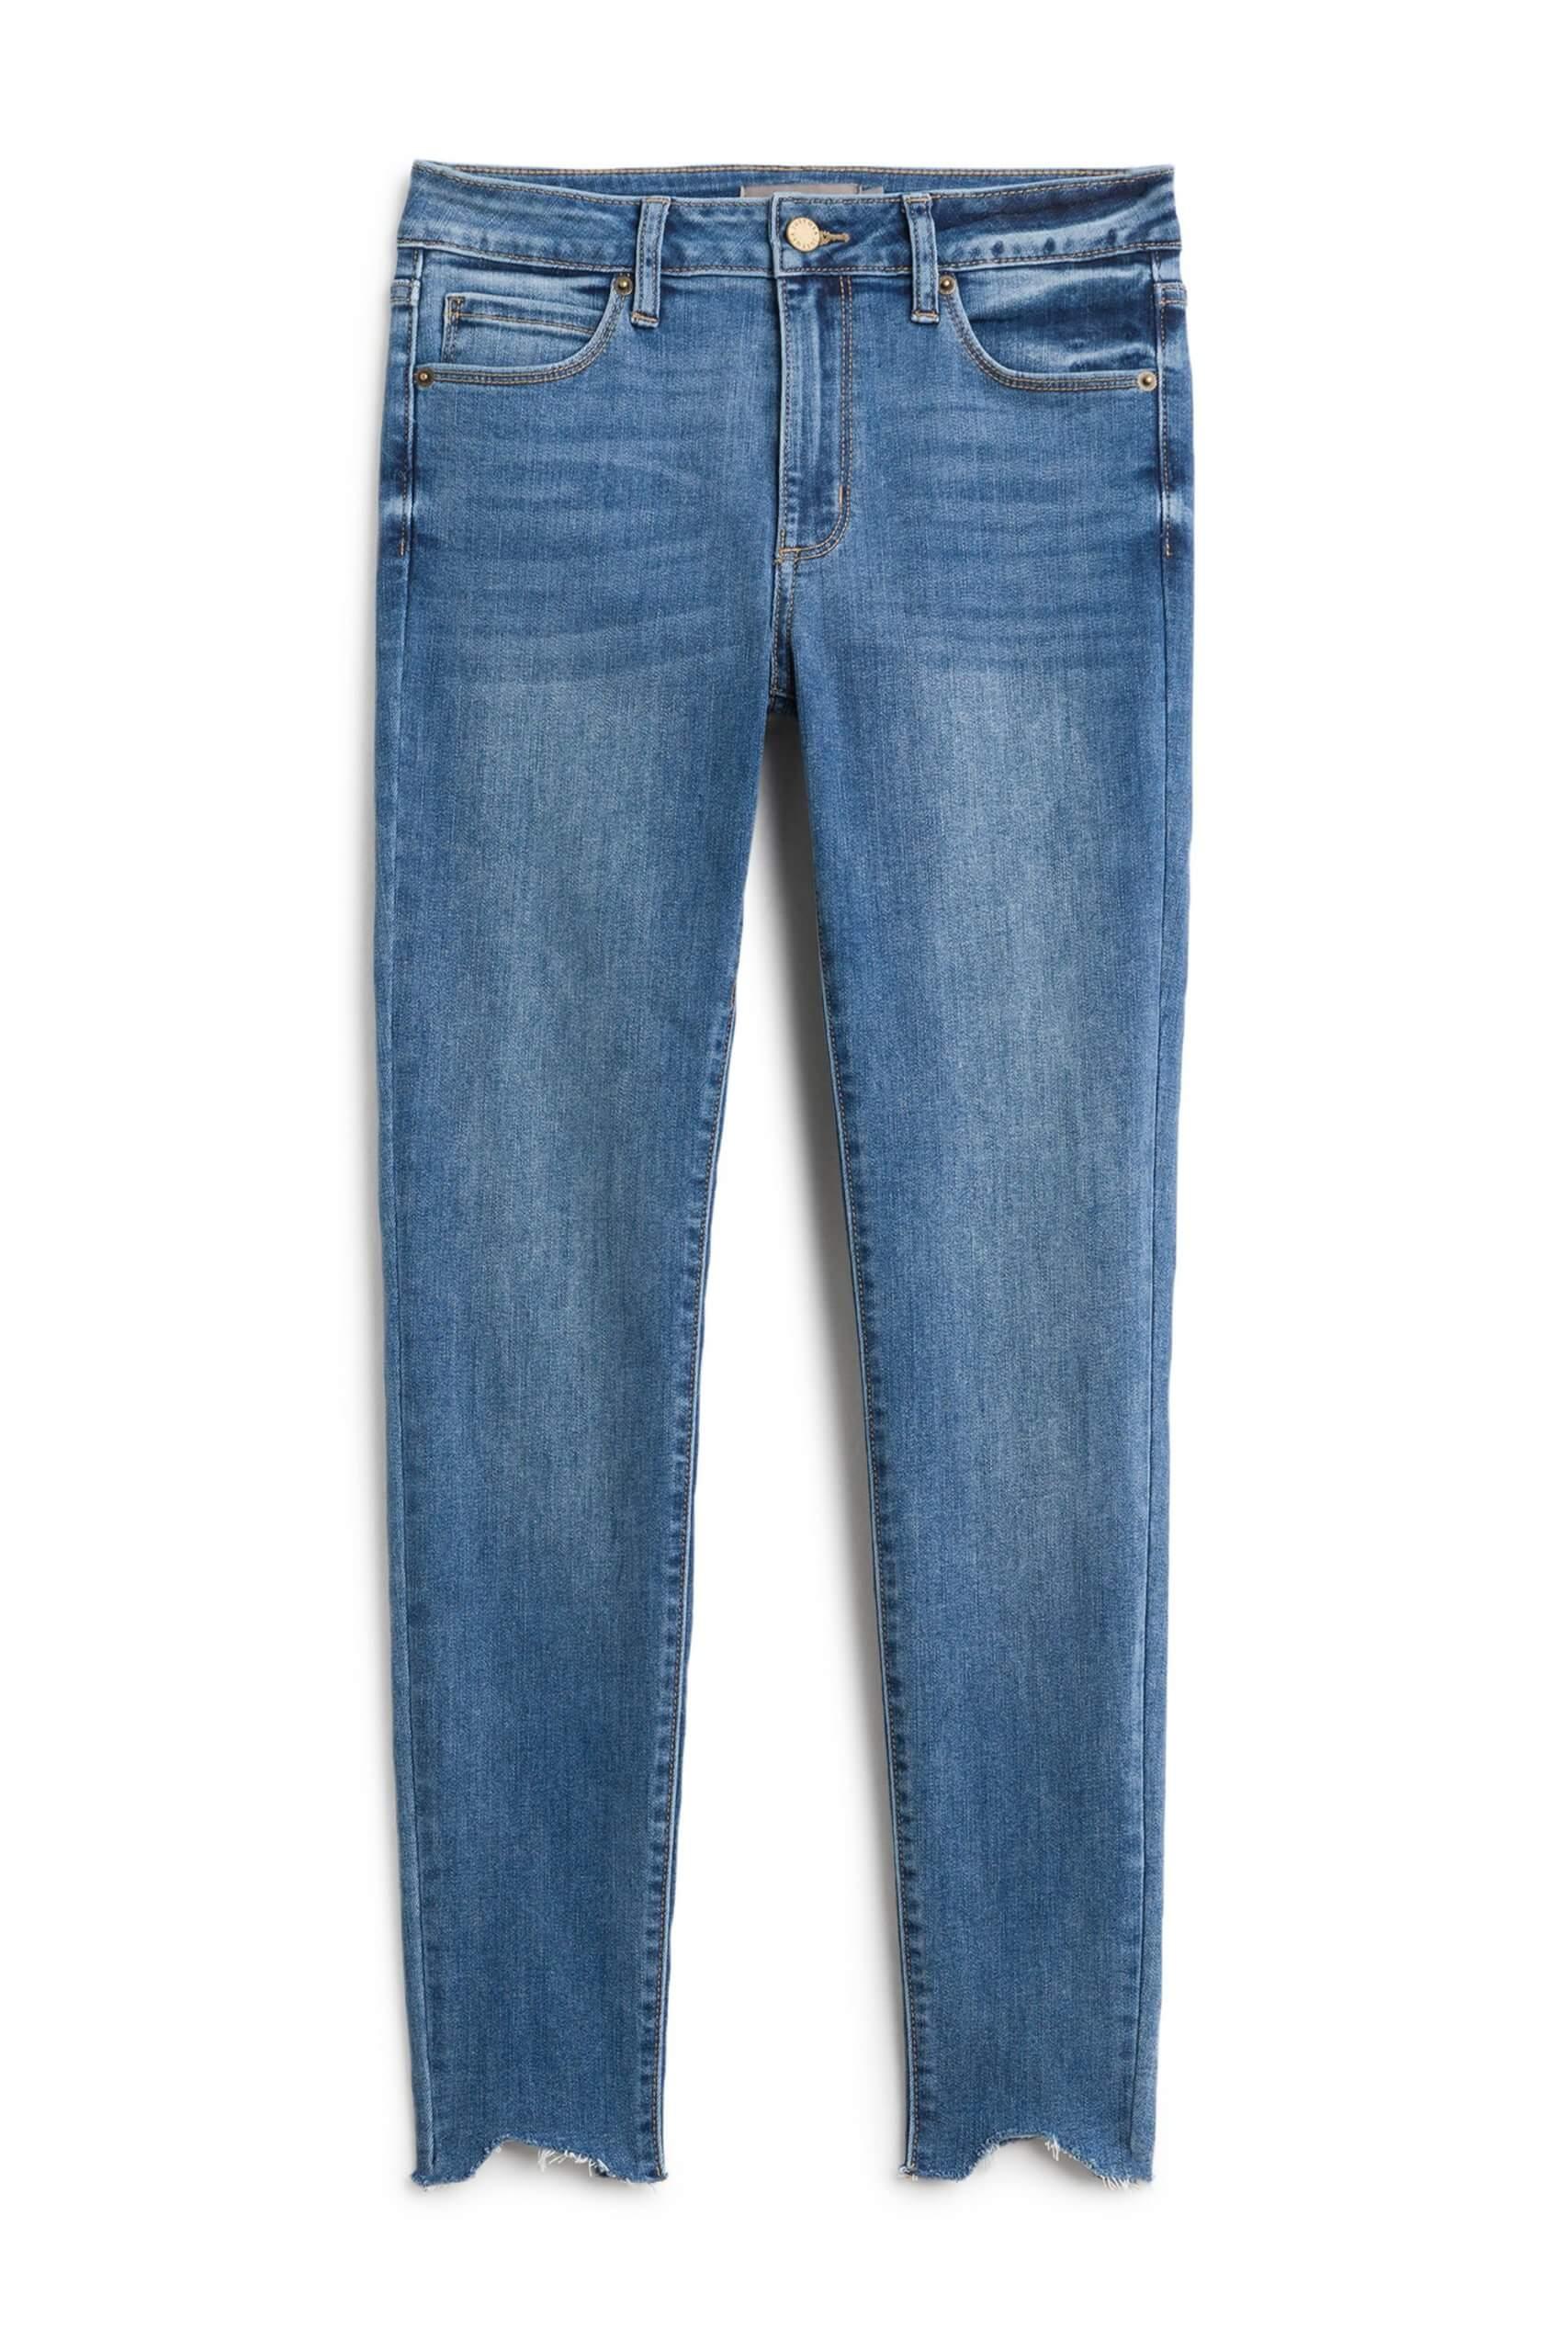 Stitch Fix Women's blue skinny jeans.